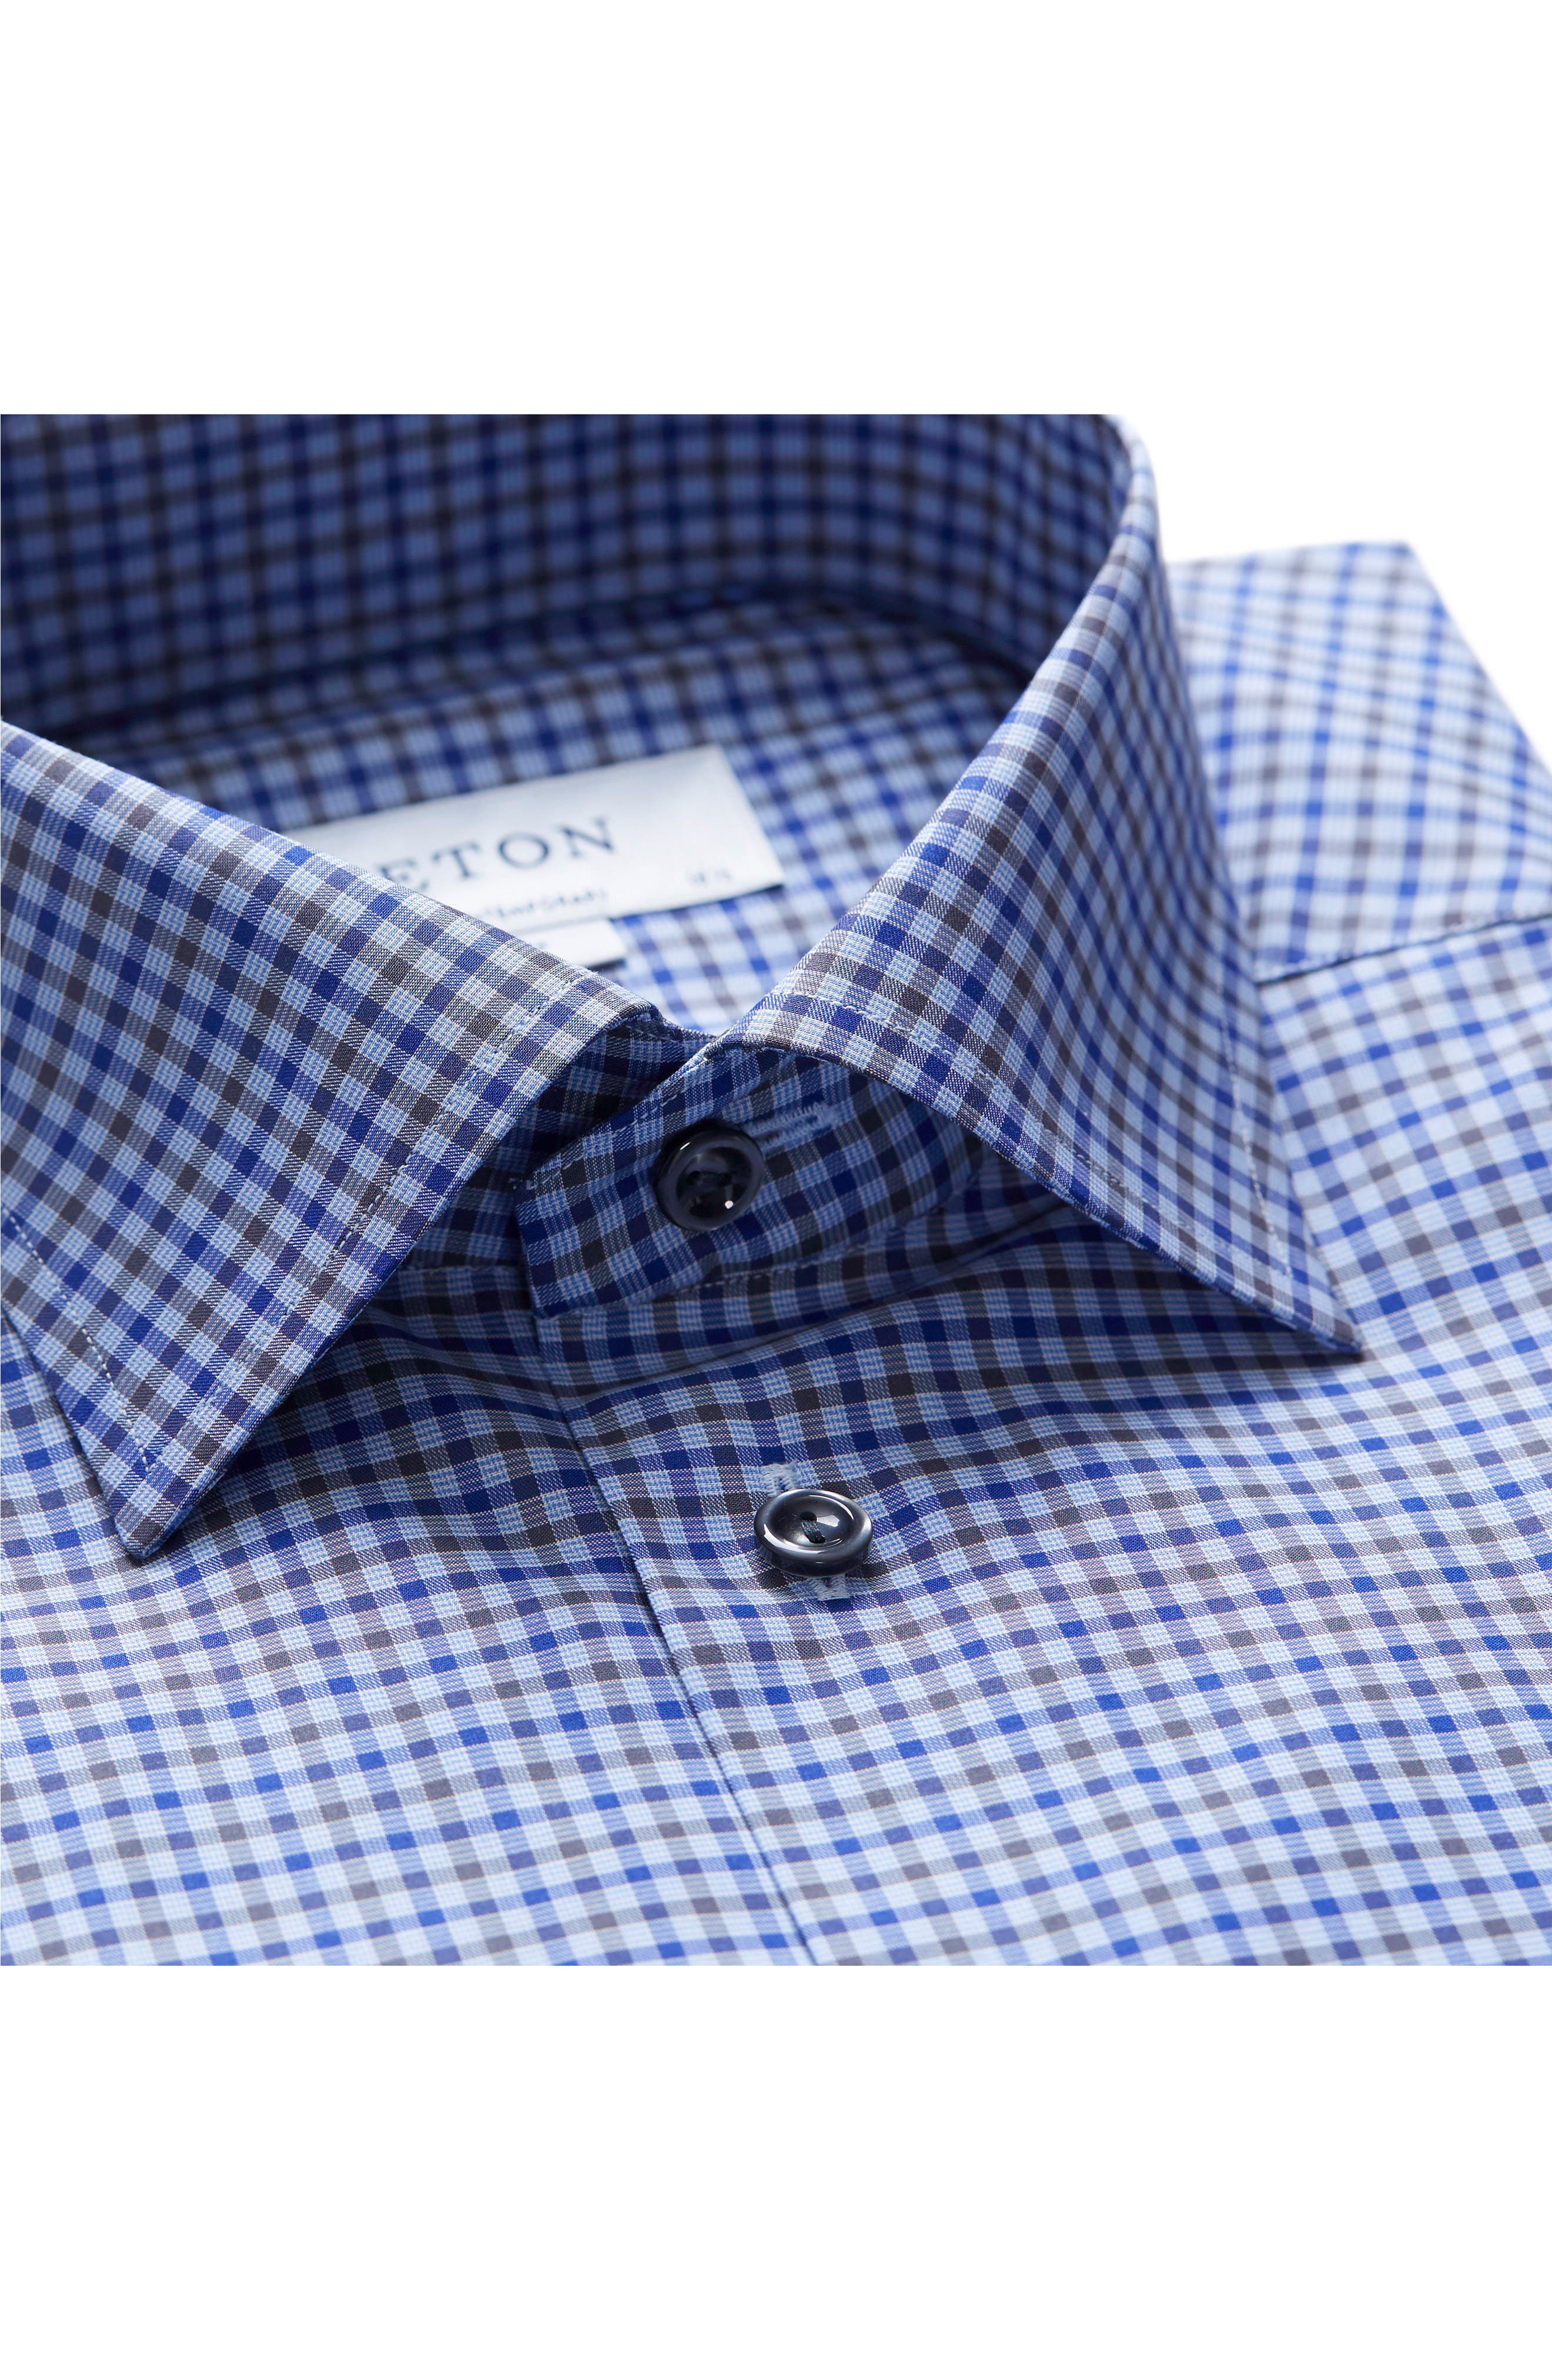 Alternate Image 3  - Eton Contemporary Fit Check Dress Shirt